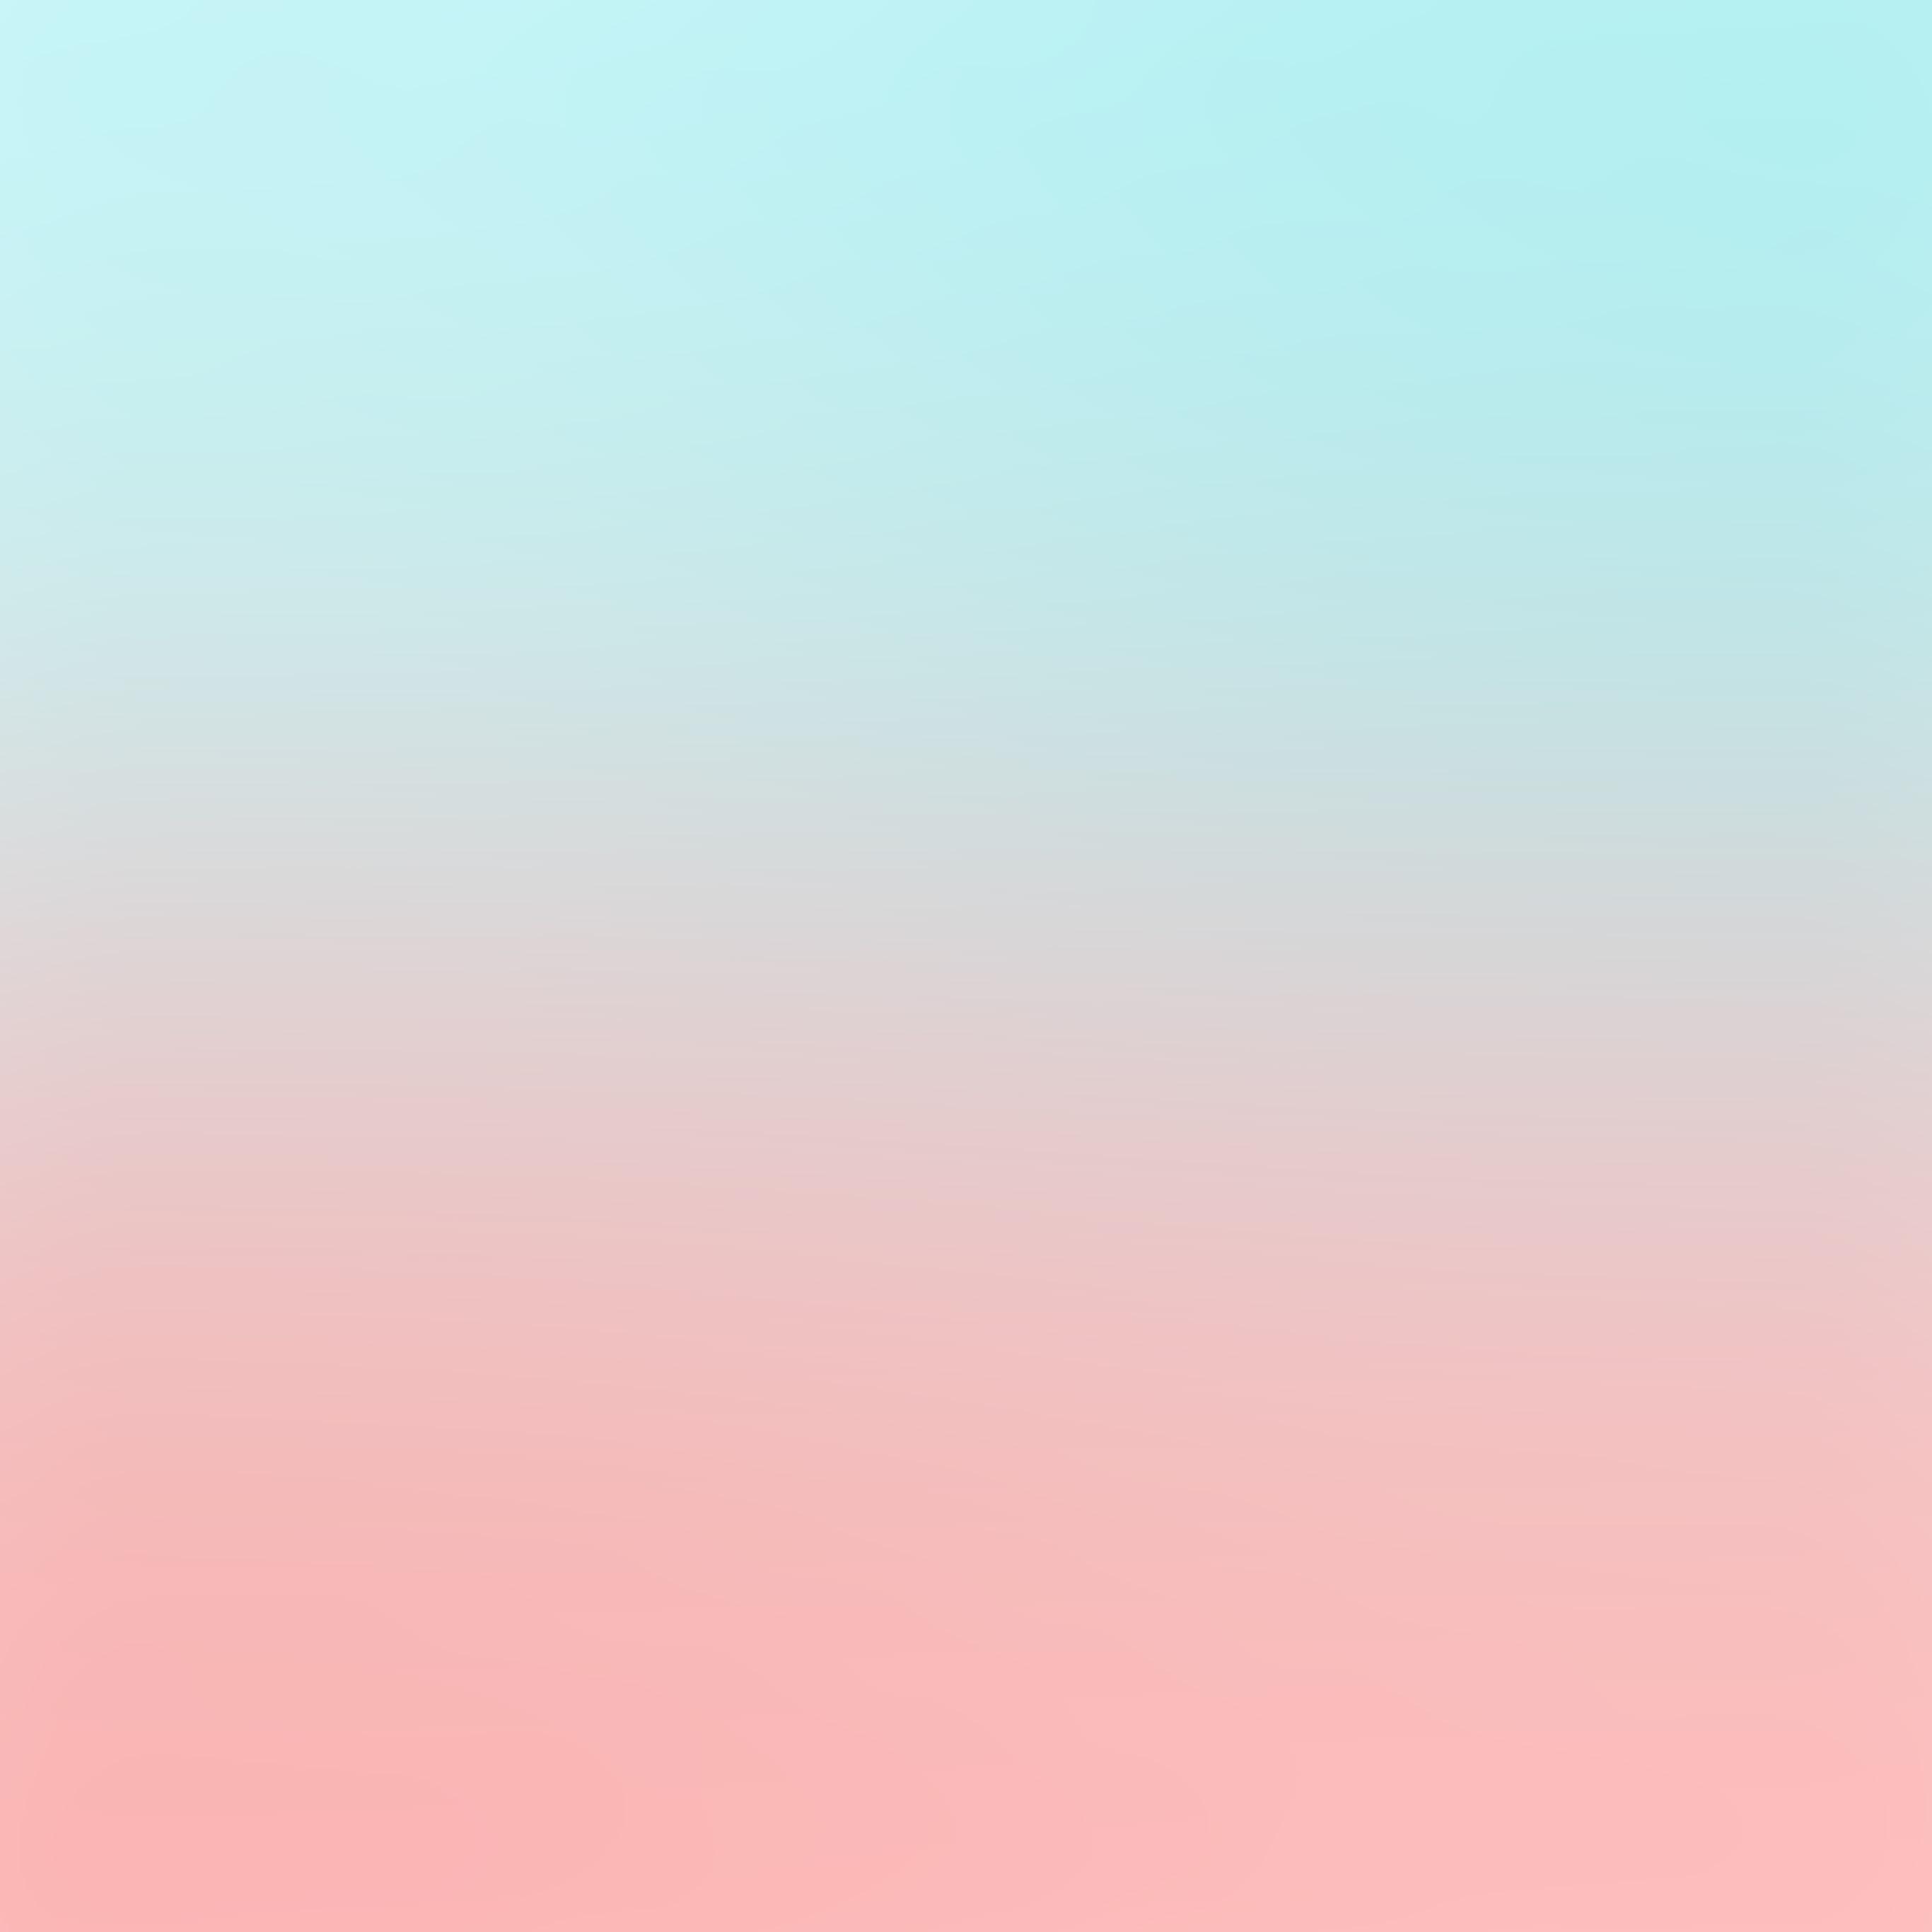 Sm40 Blue Red Soft Pastel Blur Gradation Wallpaper